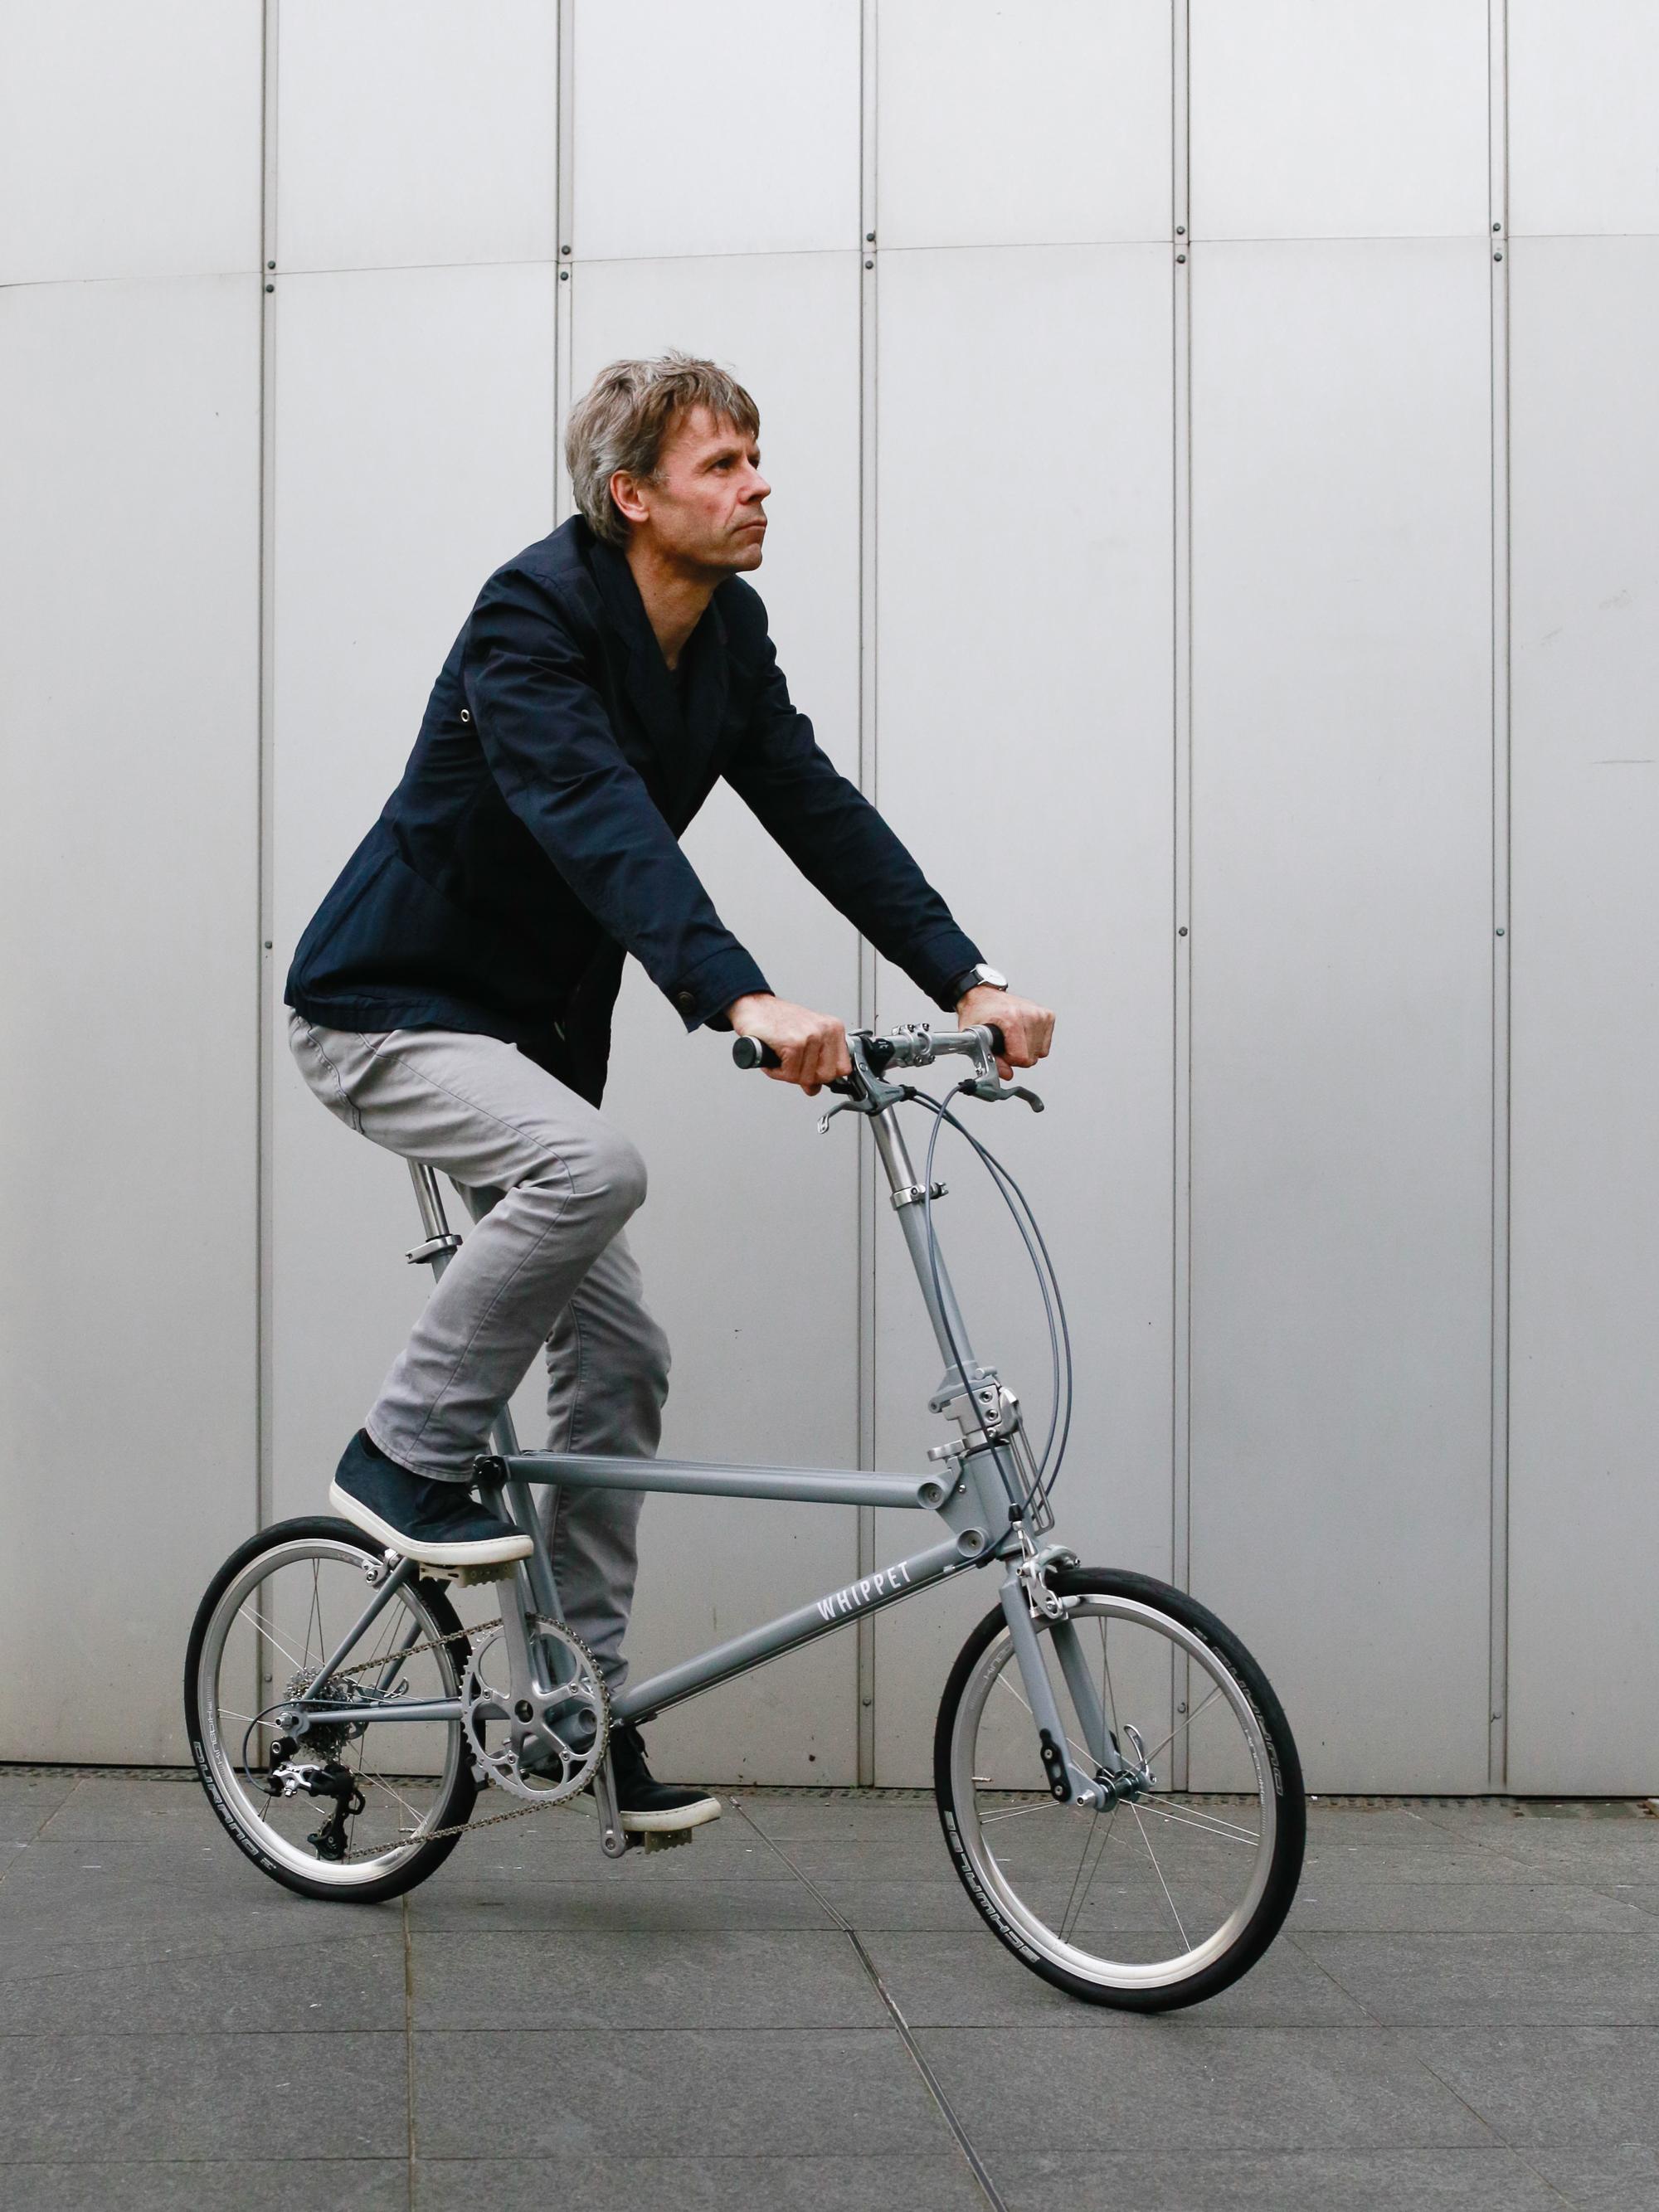 Whippet Bicycle - urban riding